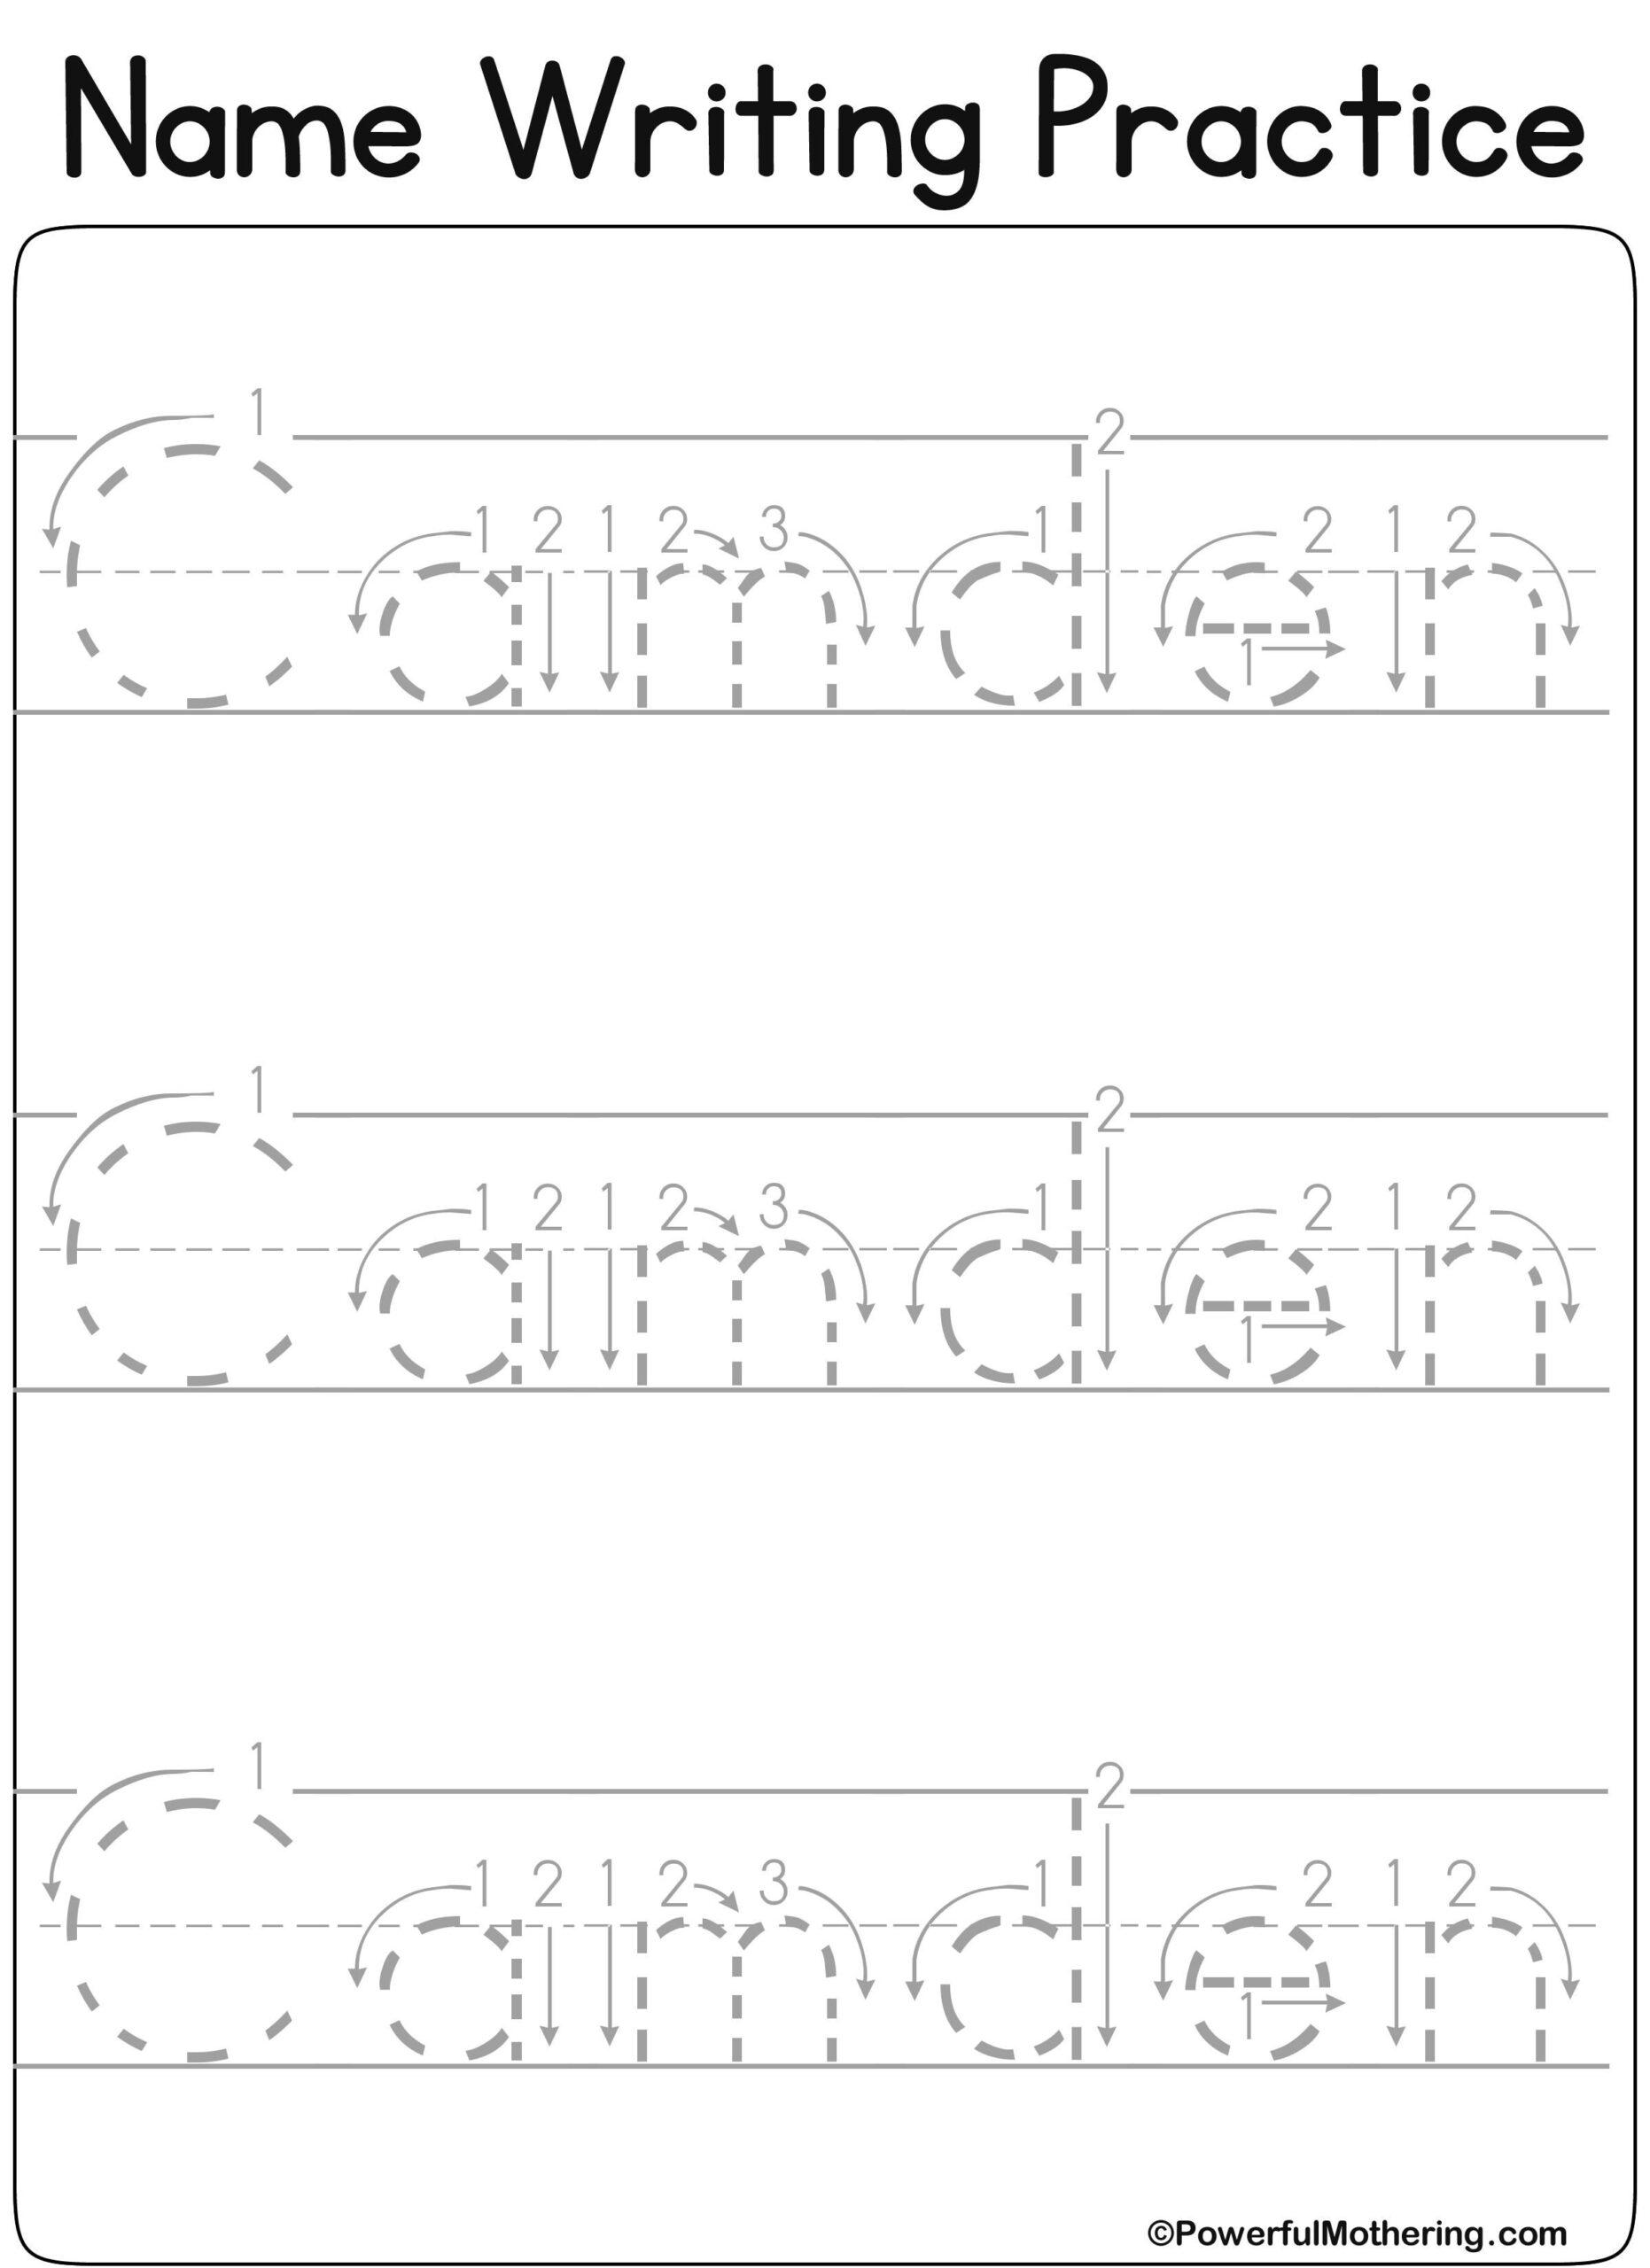 Www.createprintables Custom_Name_Get.php?text&#x3D regarding Name Tracing Kindergarten